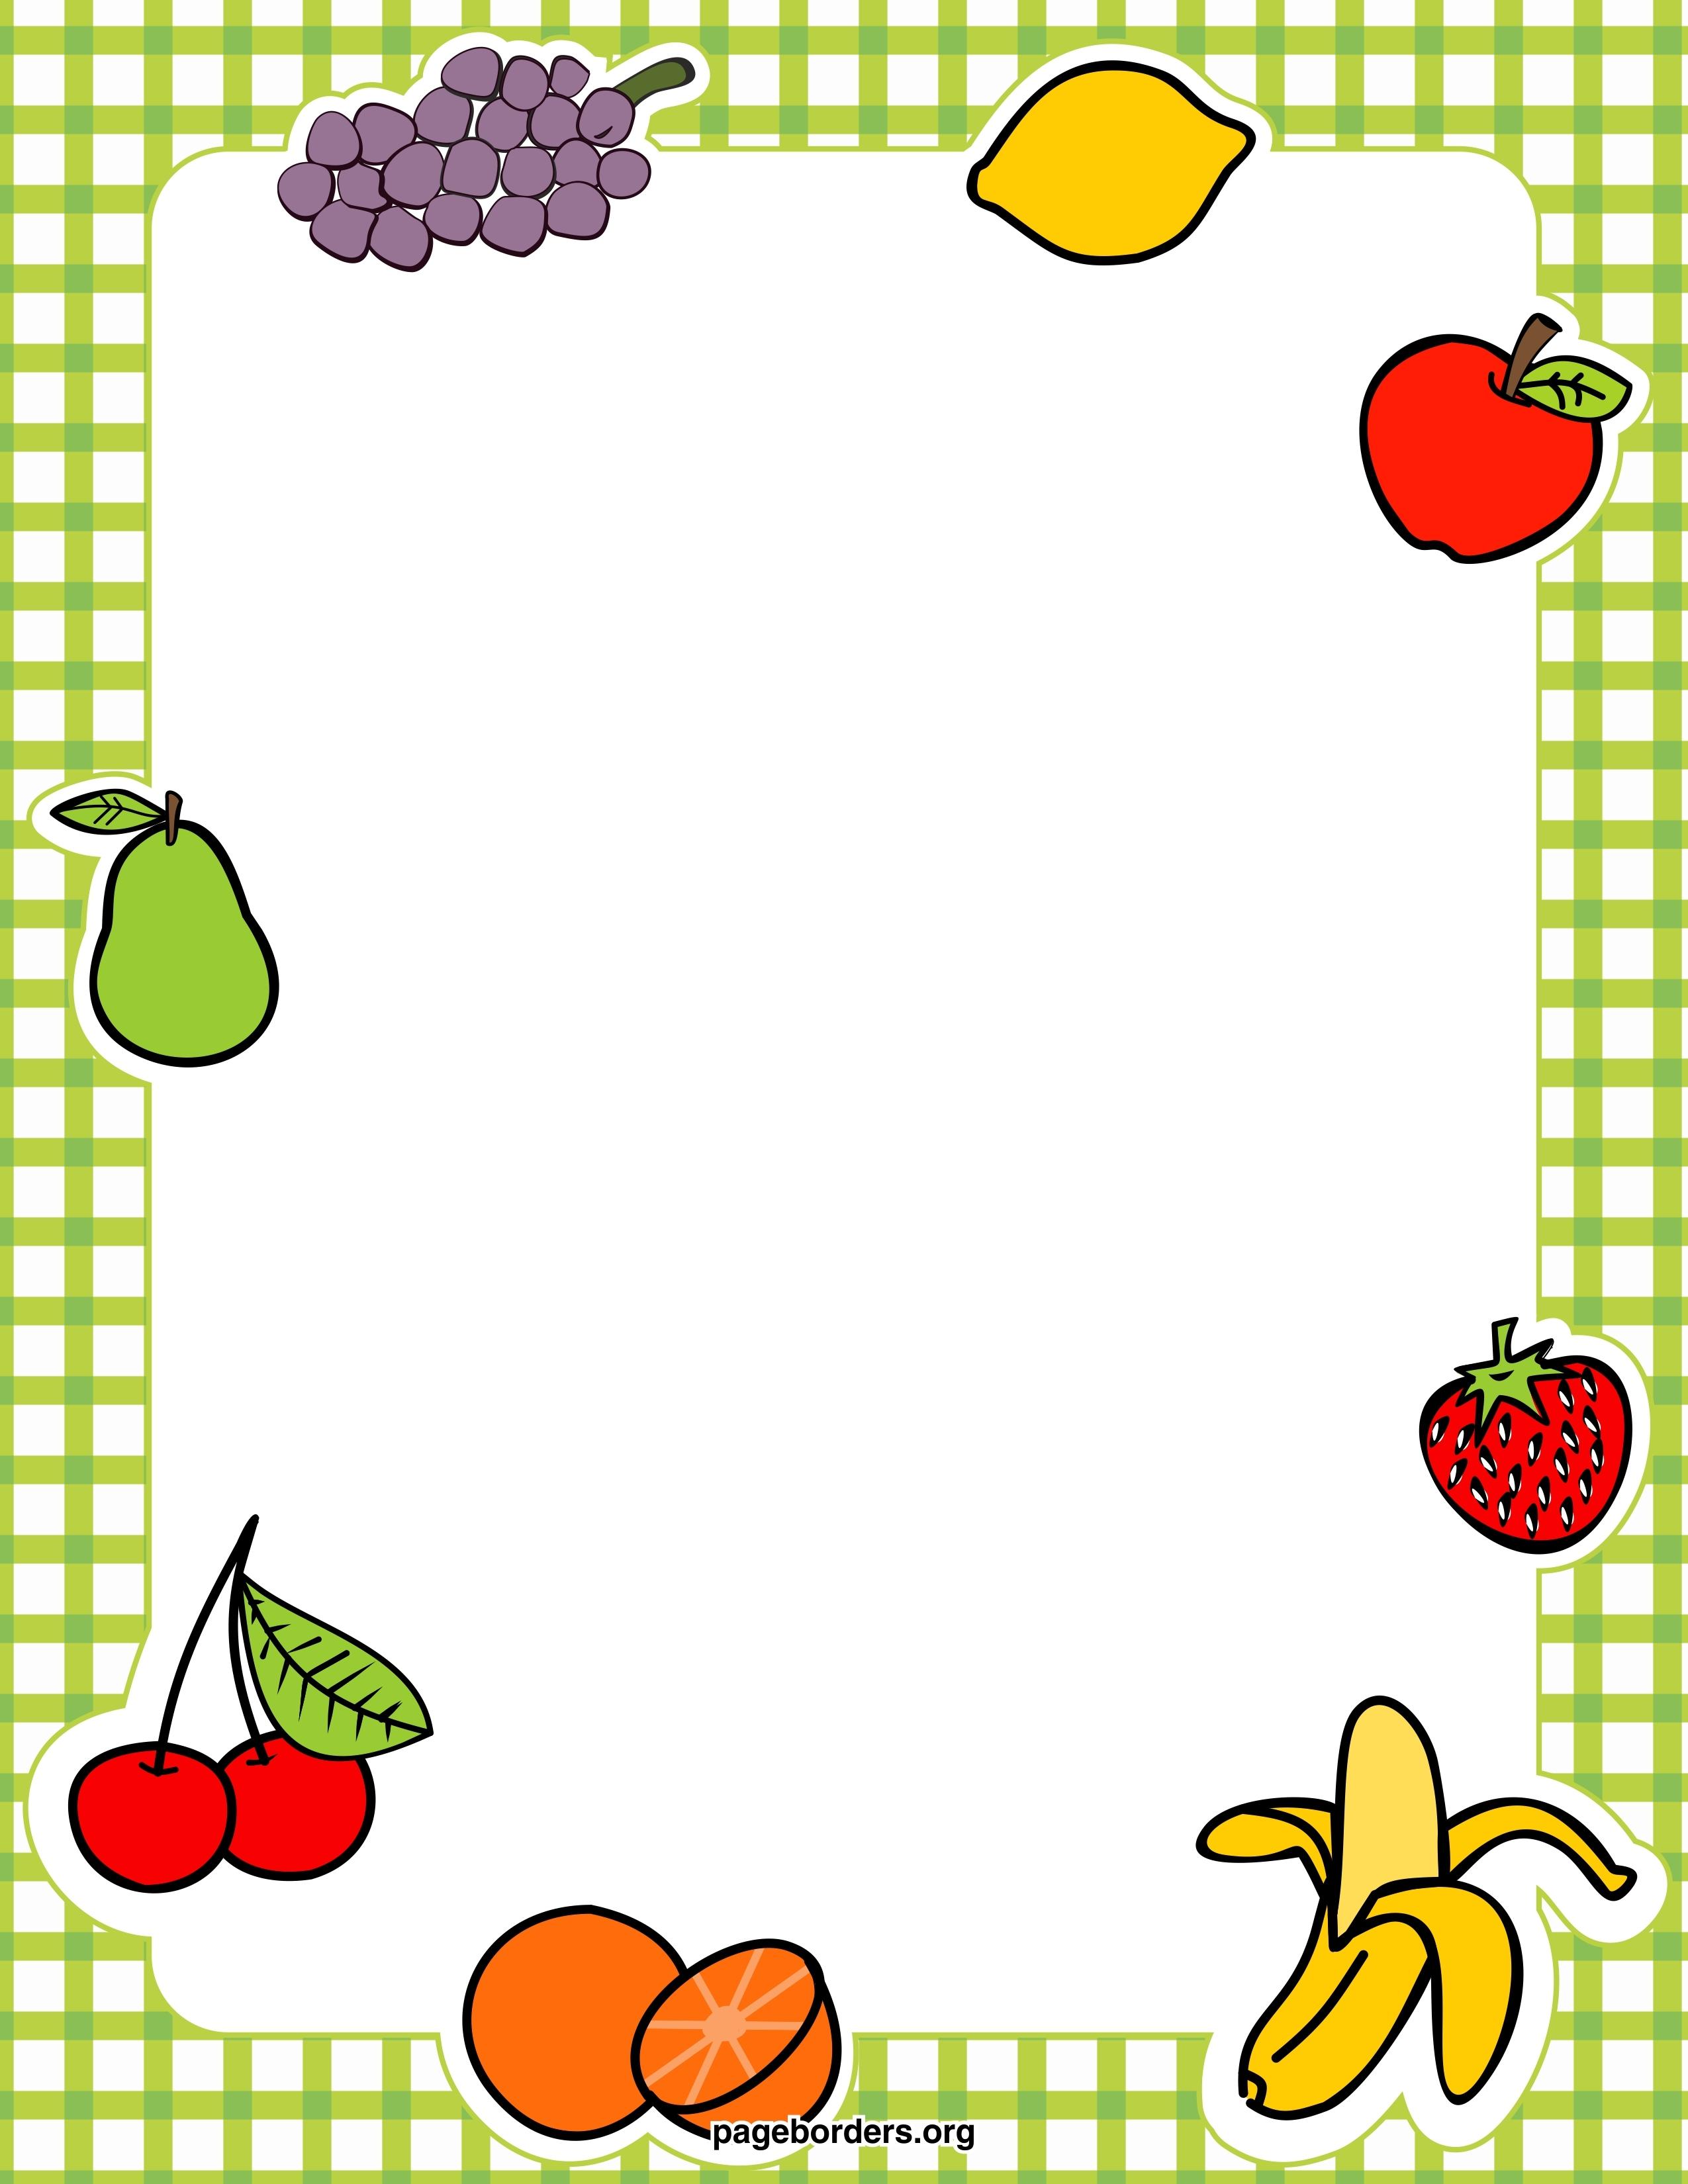 Free Breakfast Cliparts Borders, Download Free Clip Art.